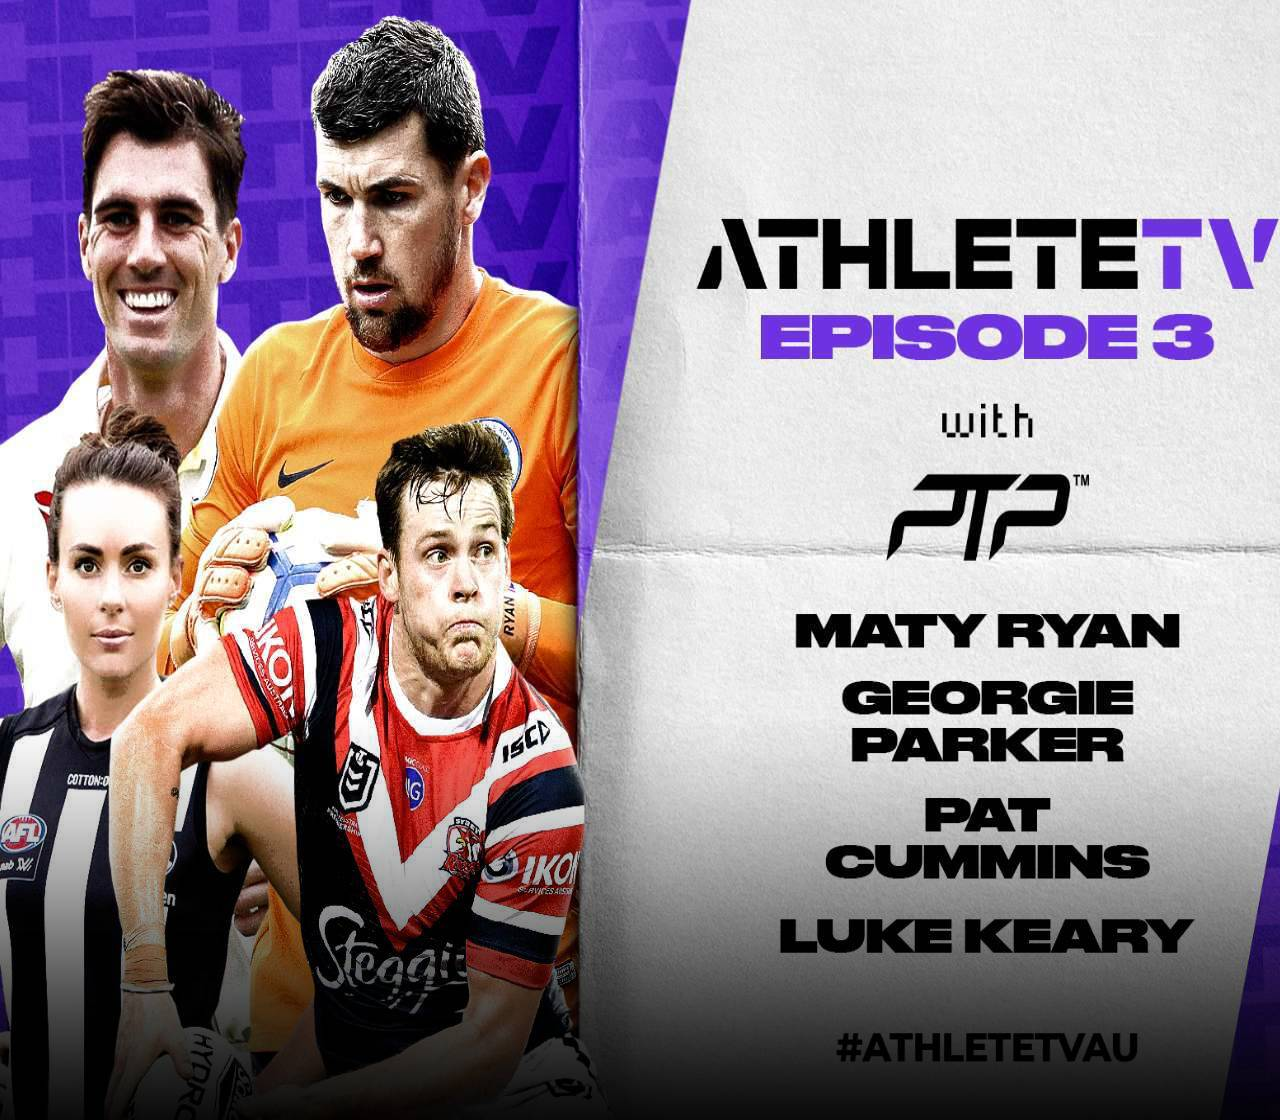 The AthletesVoice Team - AFLW - PlayersVoice